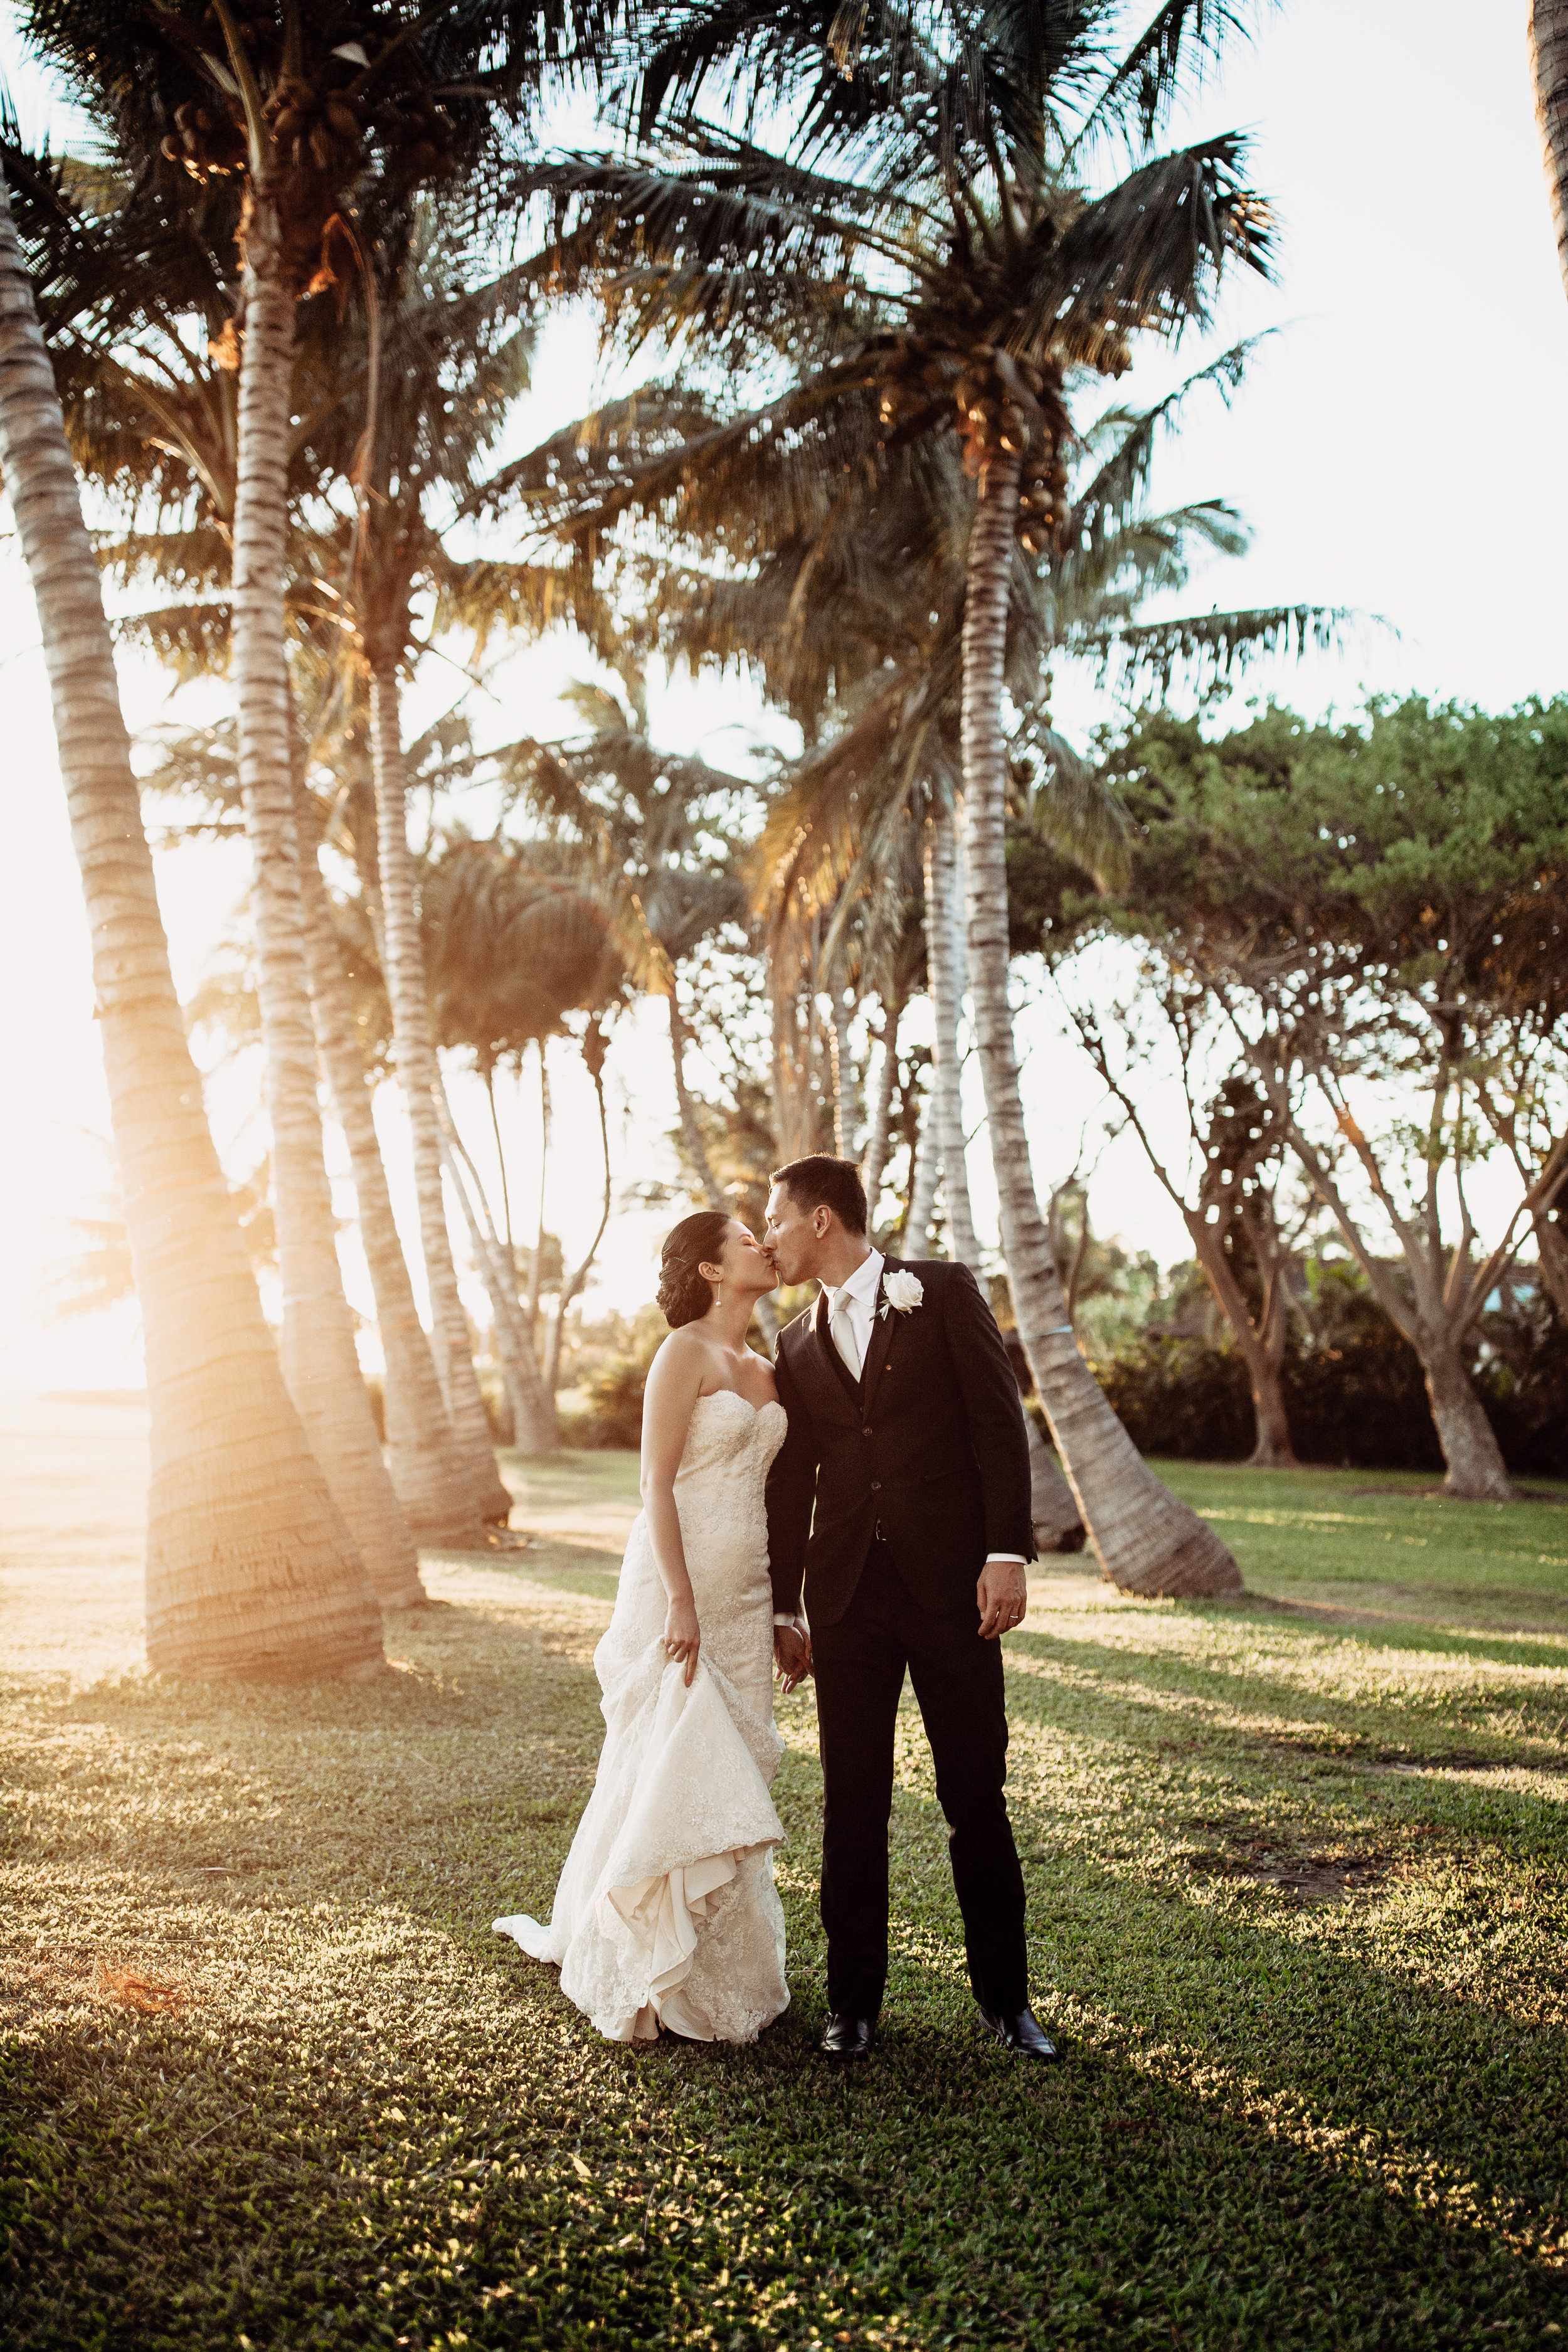 Olowalu Plantation House Wedding | Maui, Hawaii | Maya & Gen